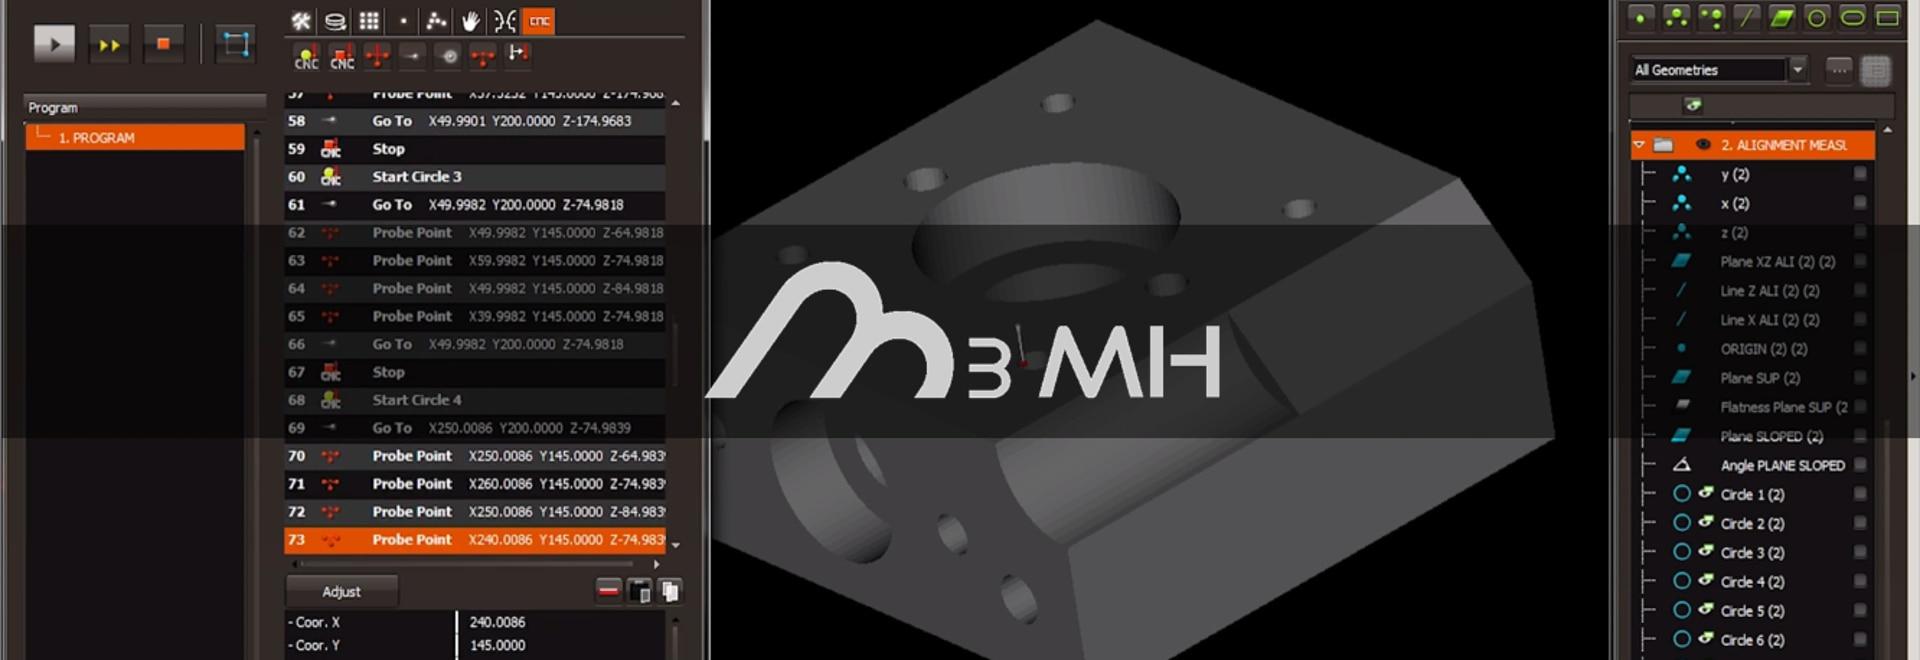 M3 MH